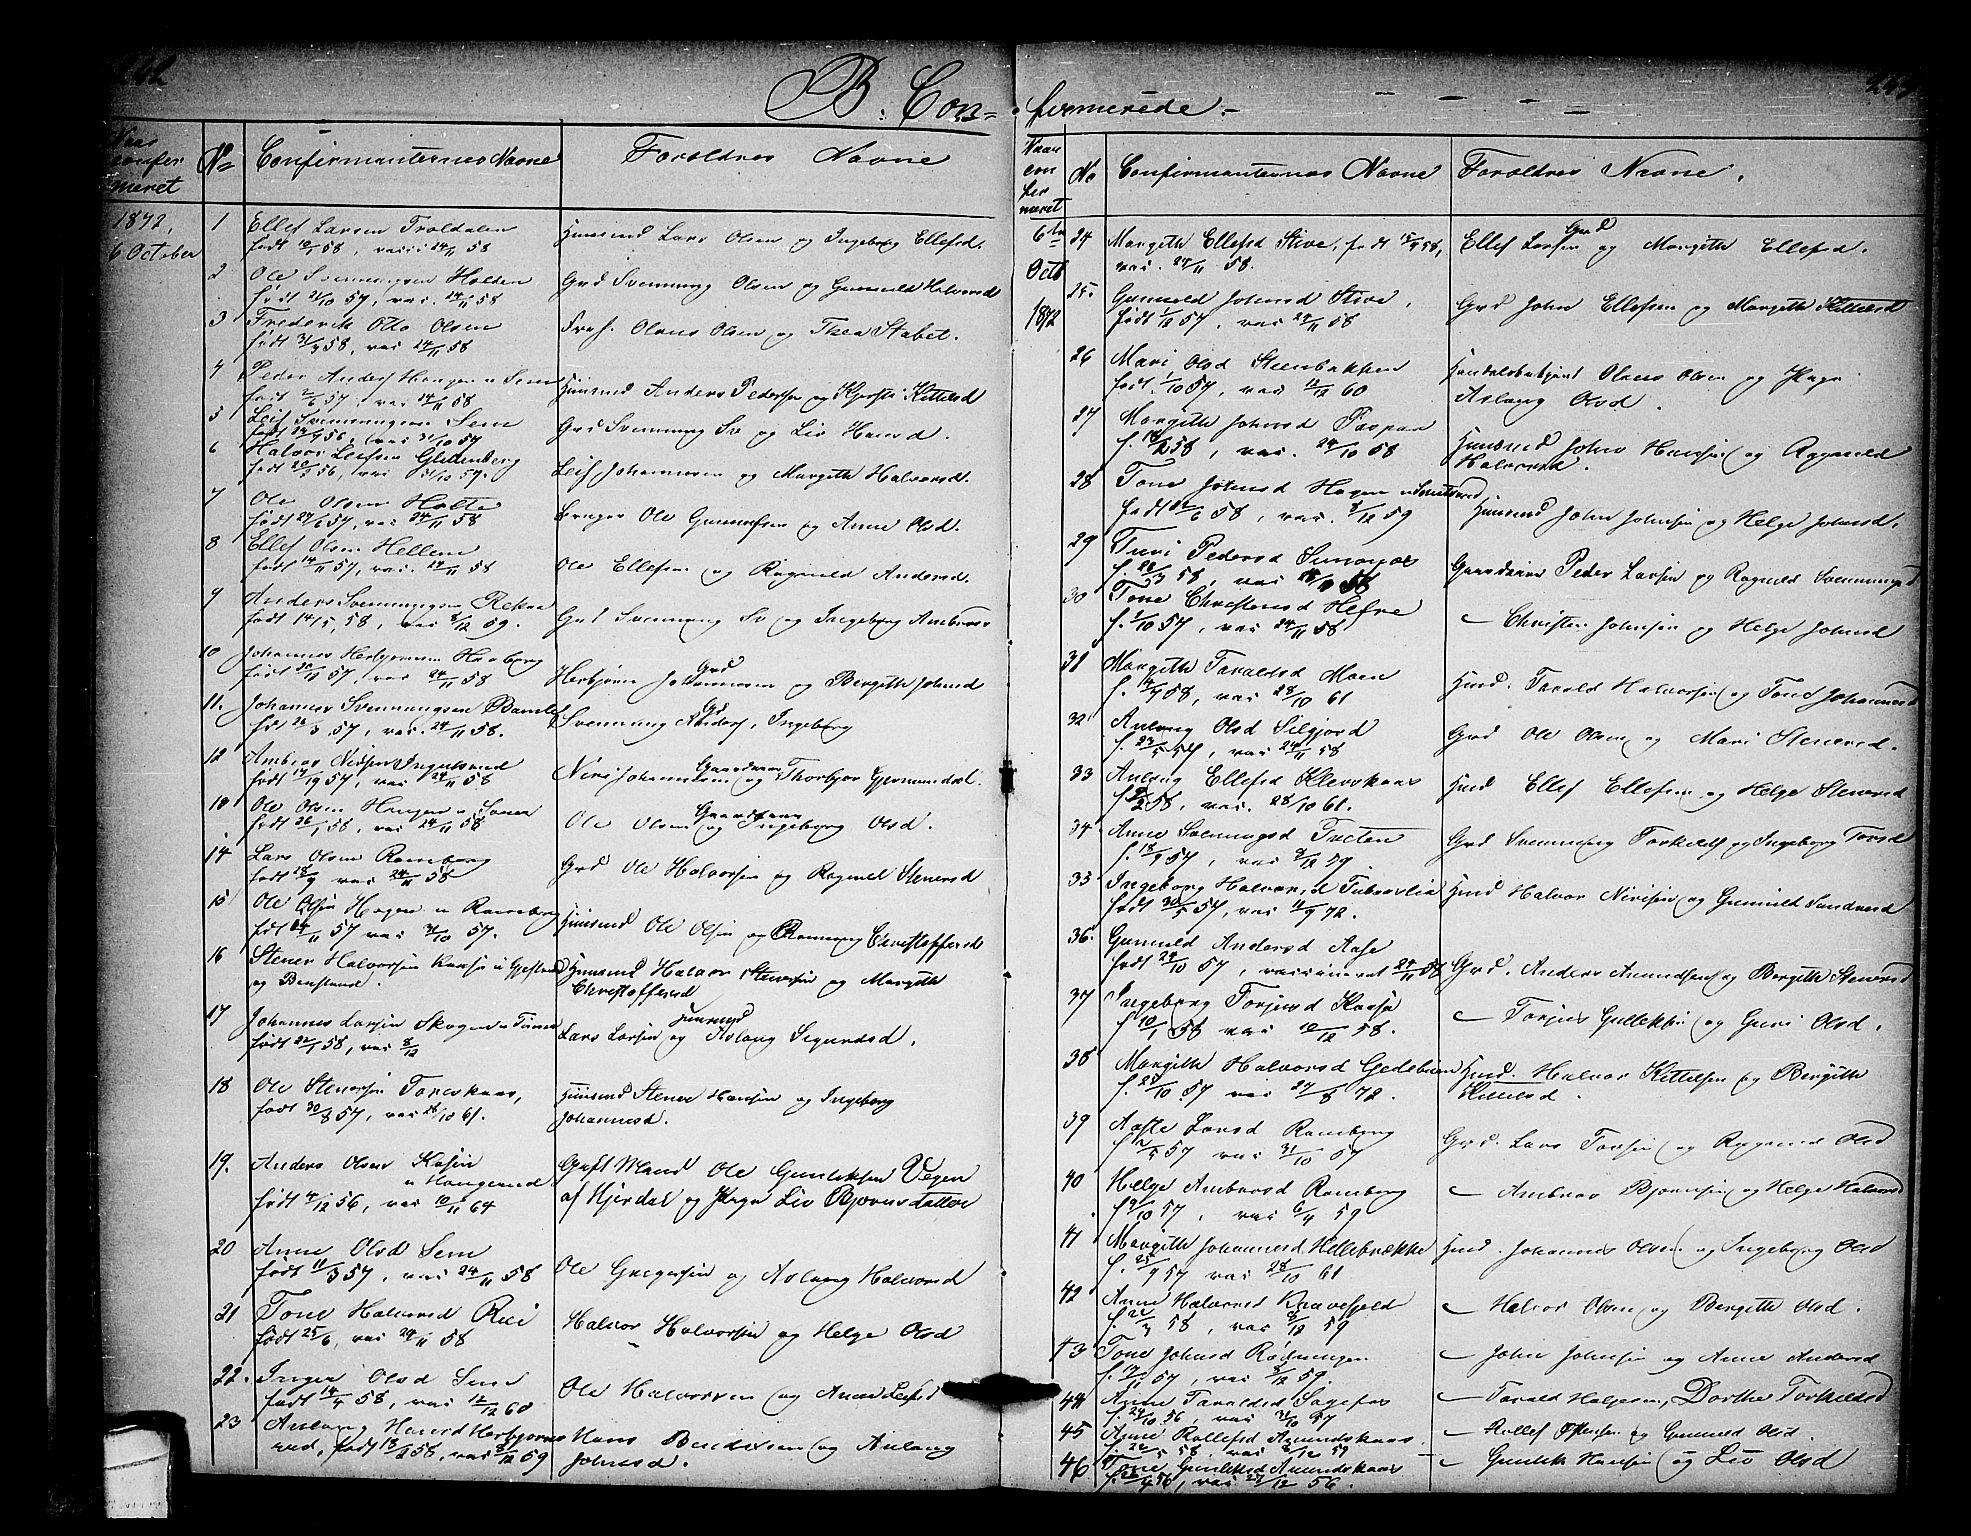 SAKO, Heddal kirkebøker, G/Ga/L0001: Klokkerbok nr. I 1, 1866-1878, s. 242-243